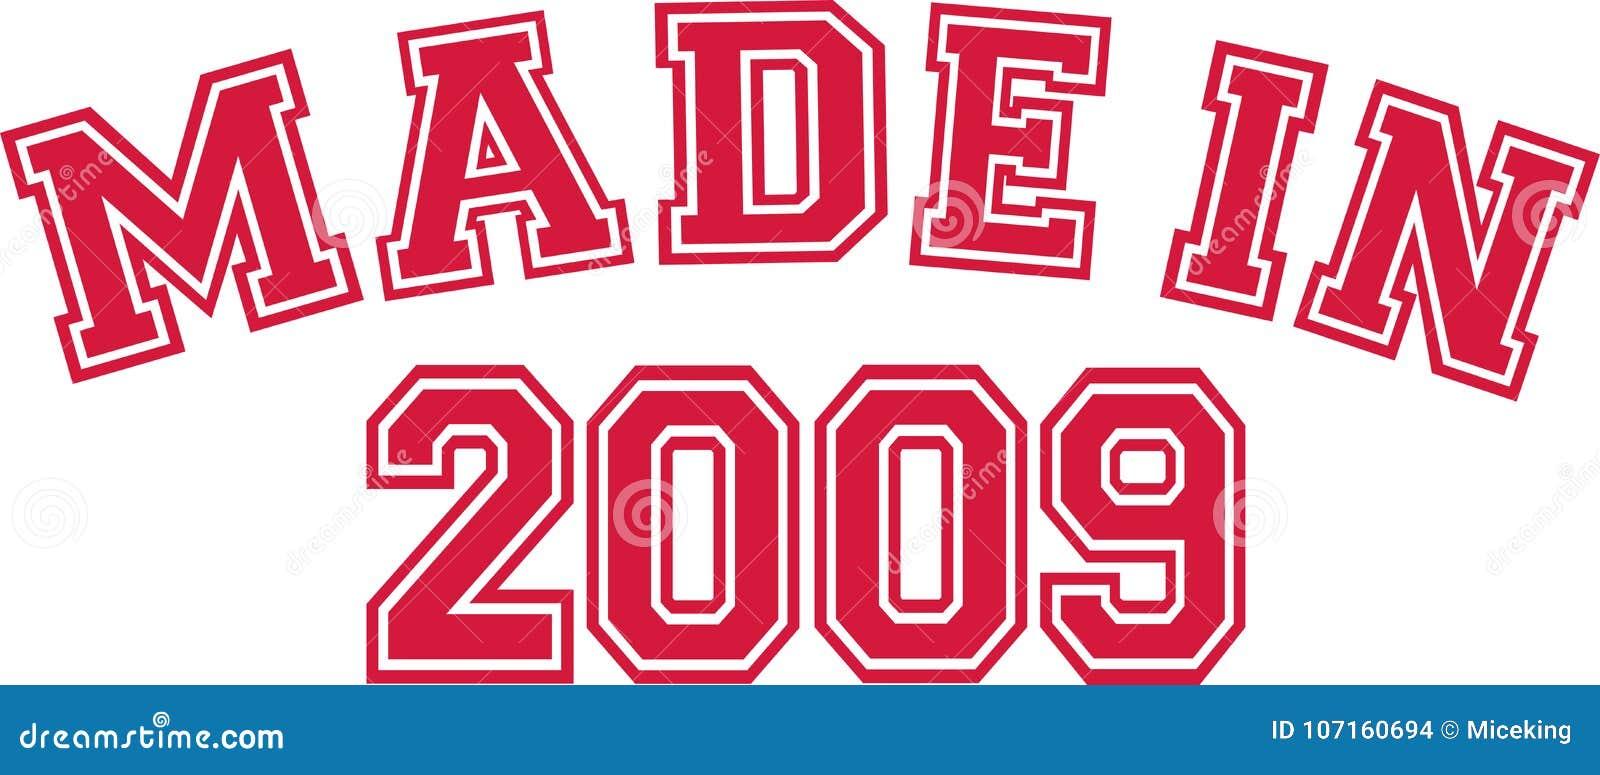 Hecho en 2009